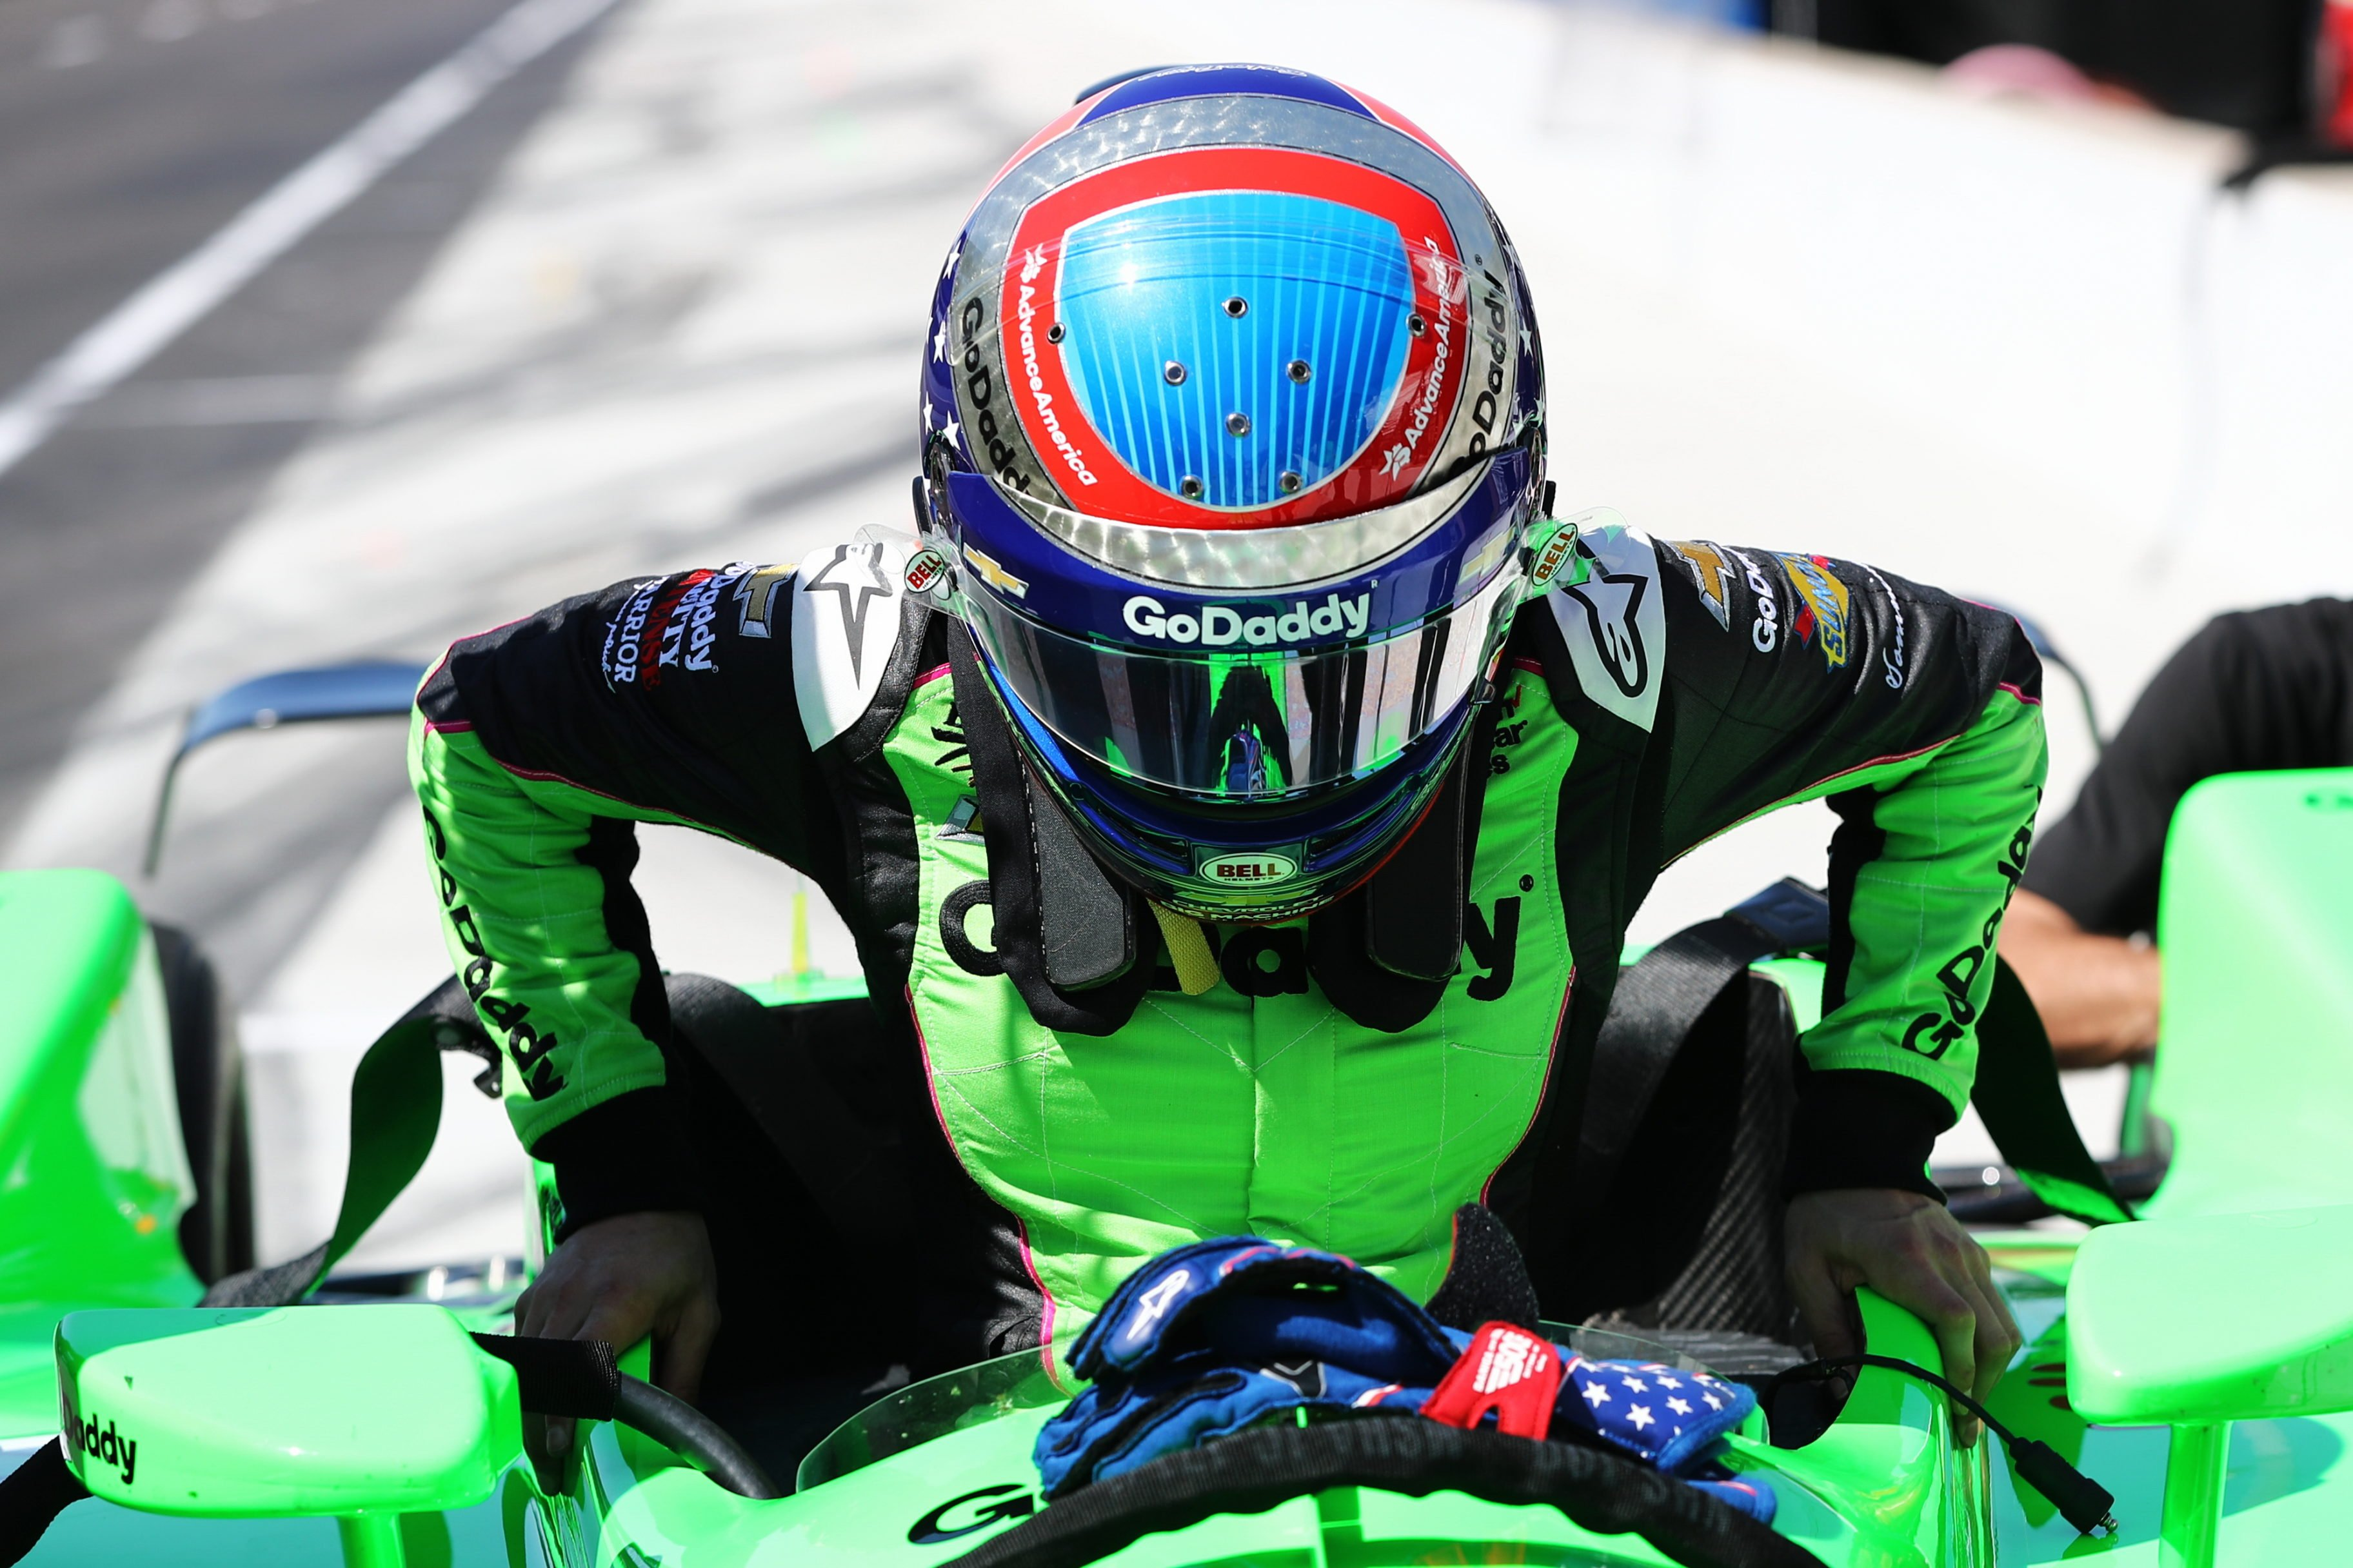 Danica Patrick - 2018 Indycar Series test